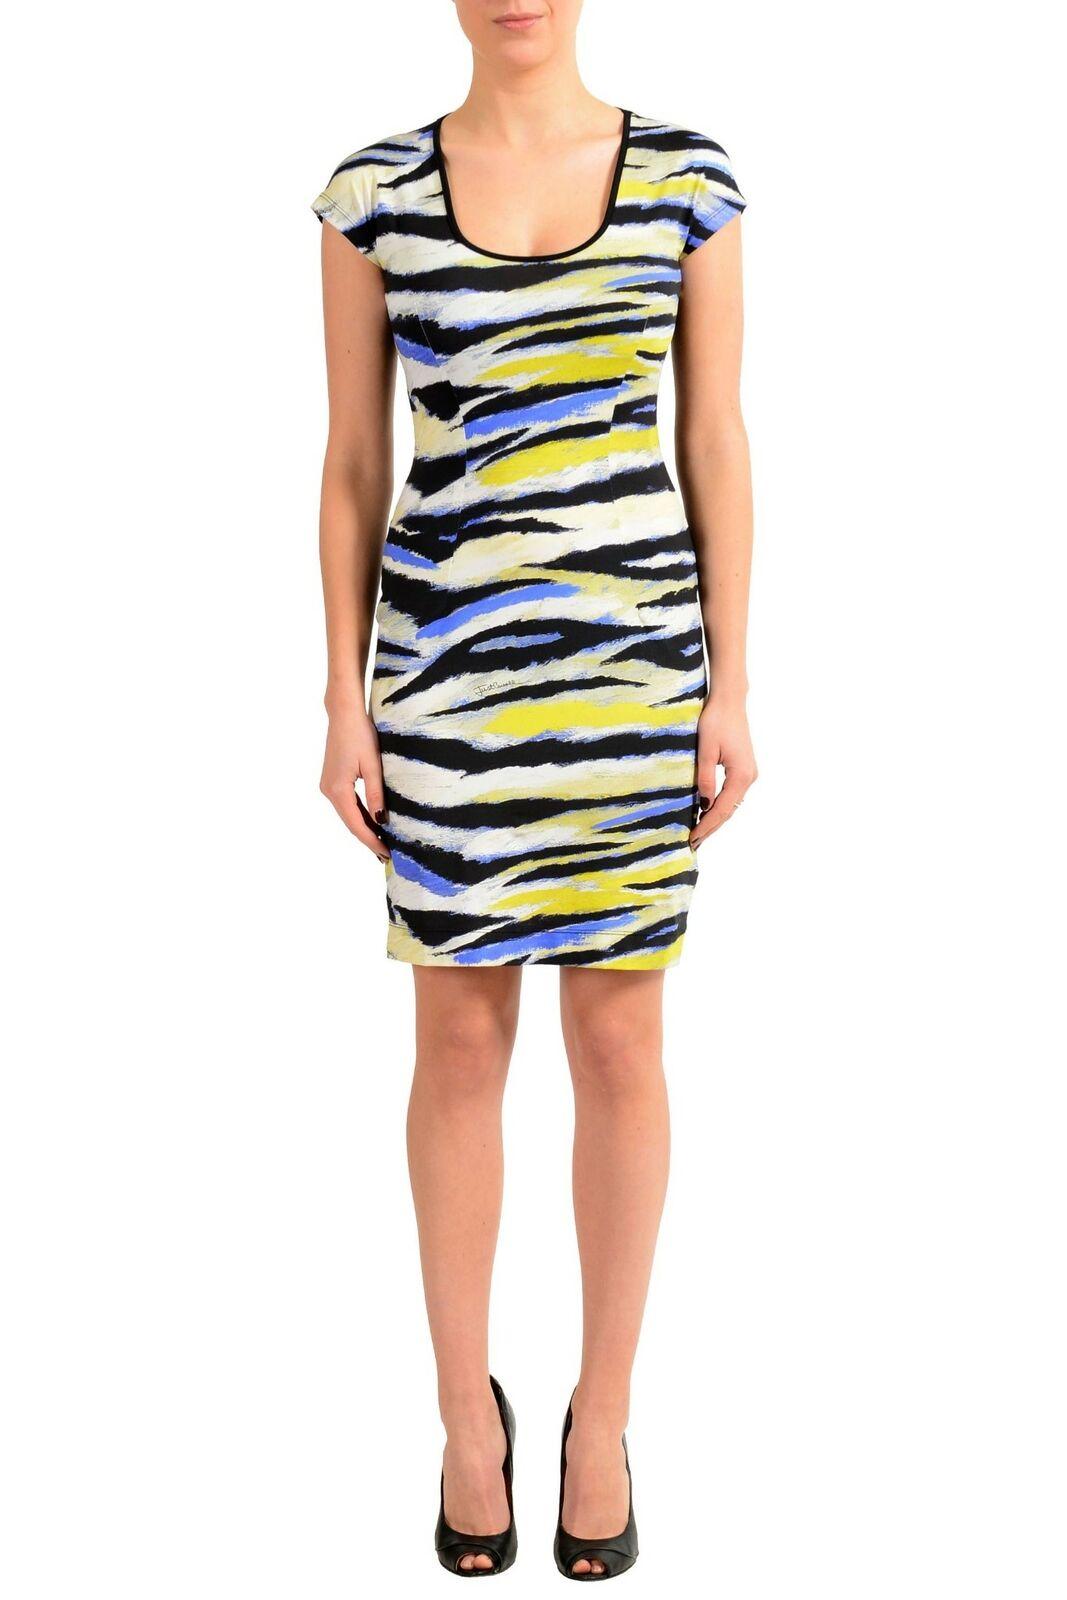 60a8bb91d5ed57 Just Mehrfarbig Kurzärmlig Damen Bodycon Kleid S XL 2XL Stretch Cavalli  ntuvak5210-Kleider